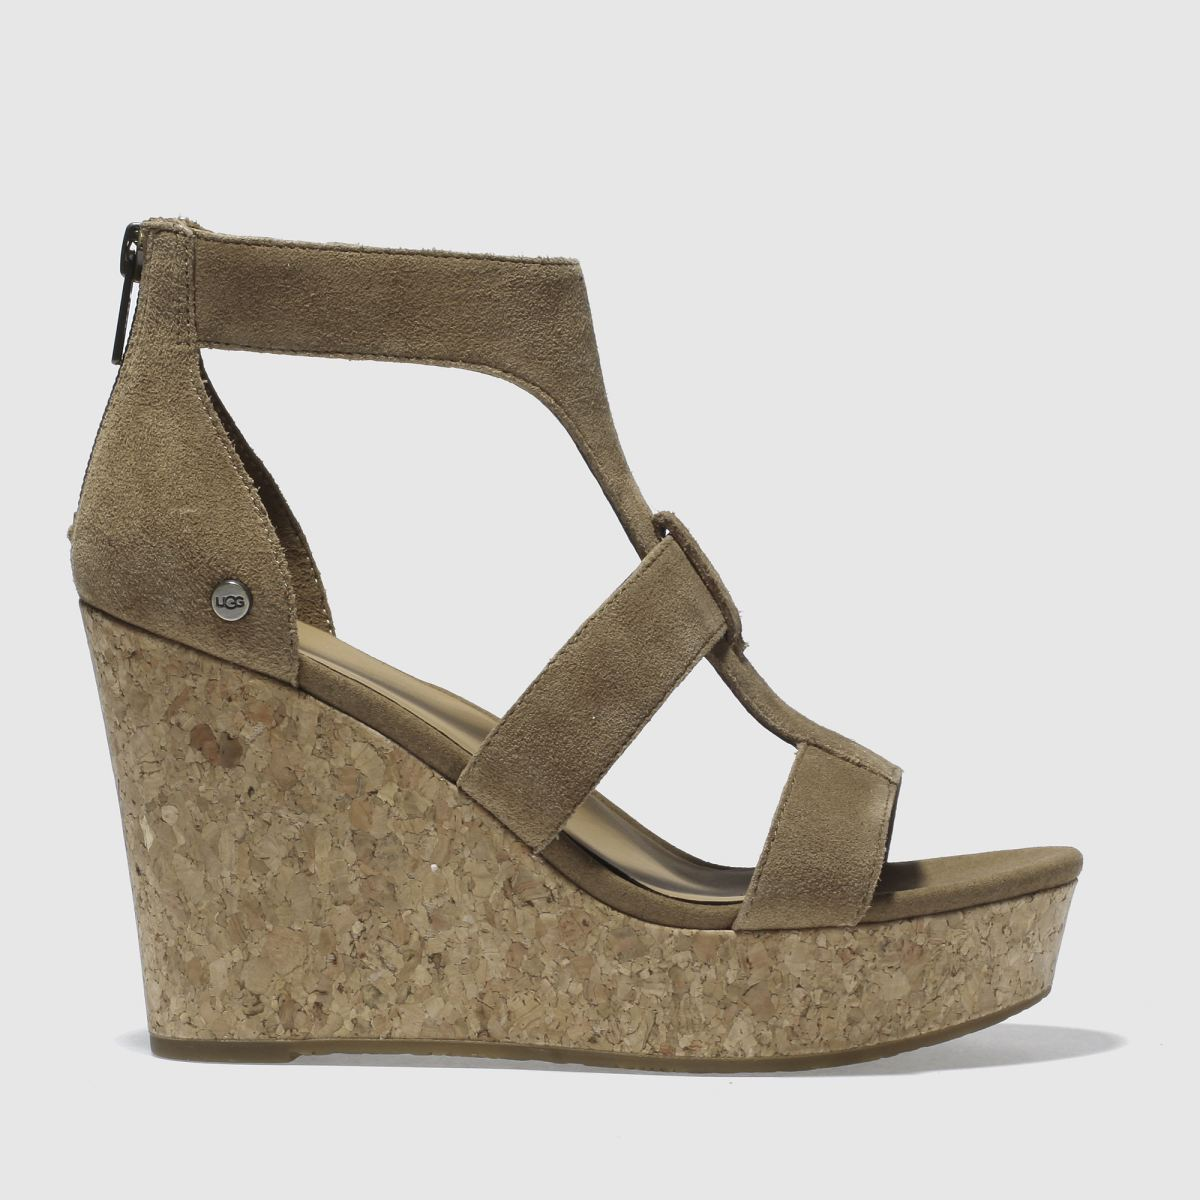 Ugg Tan Whitney Sandals